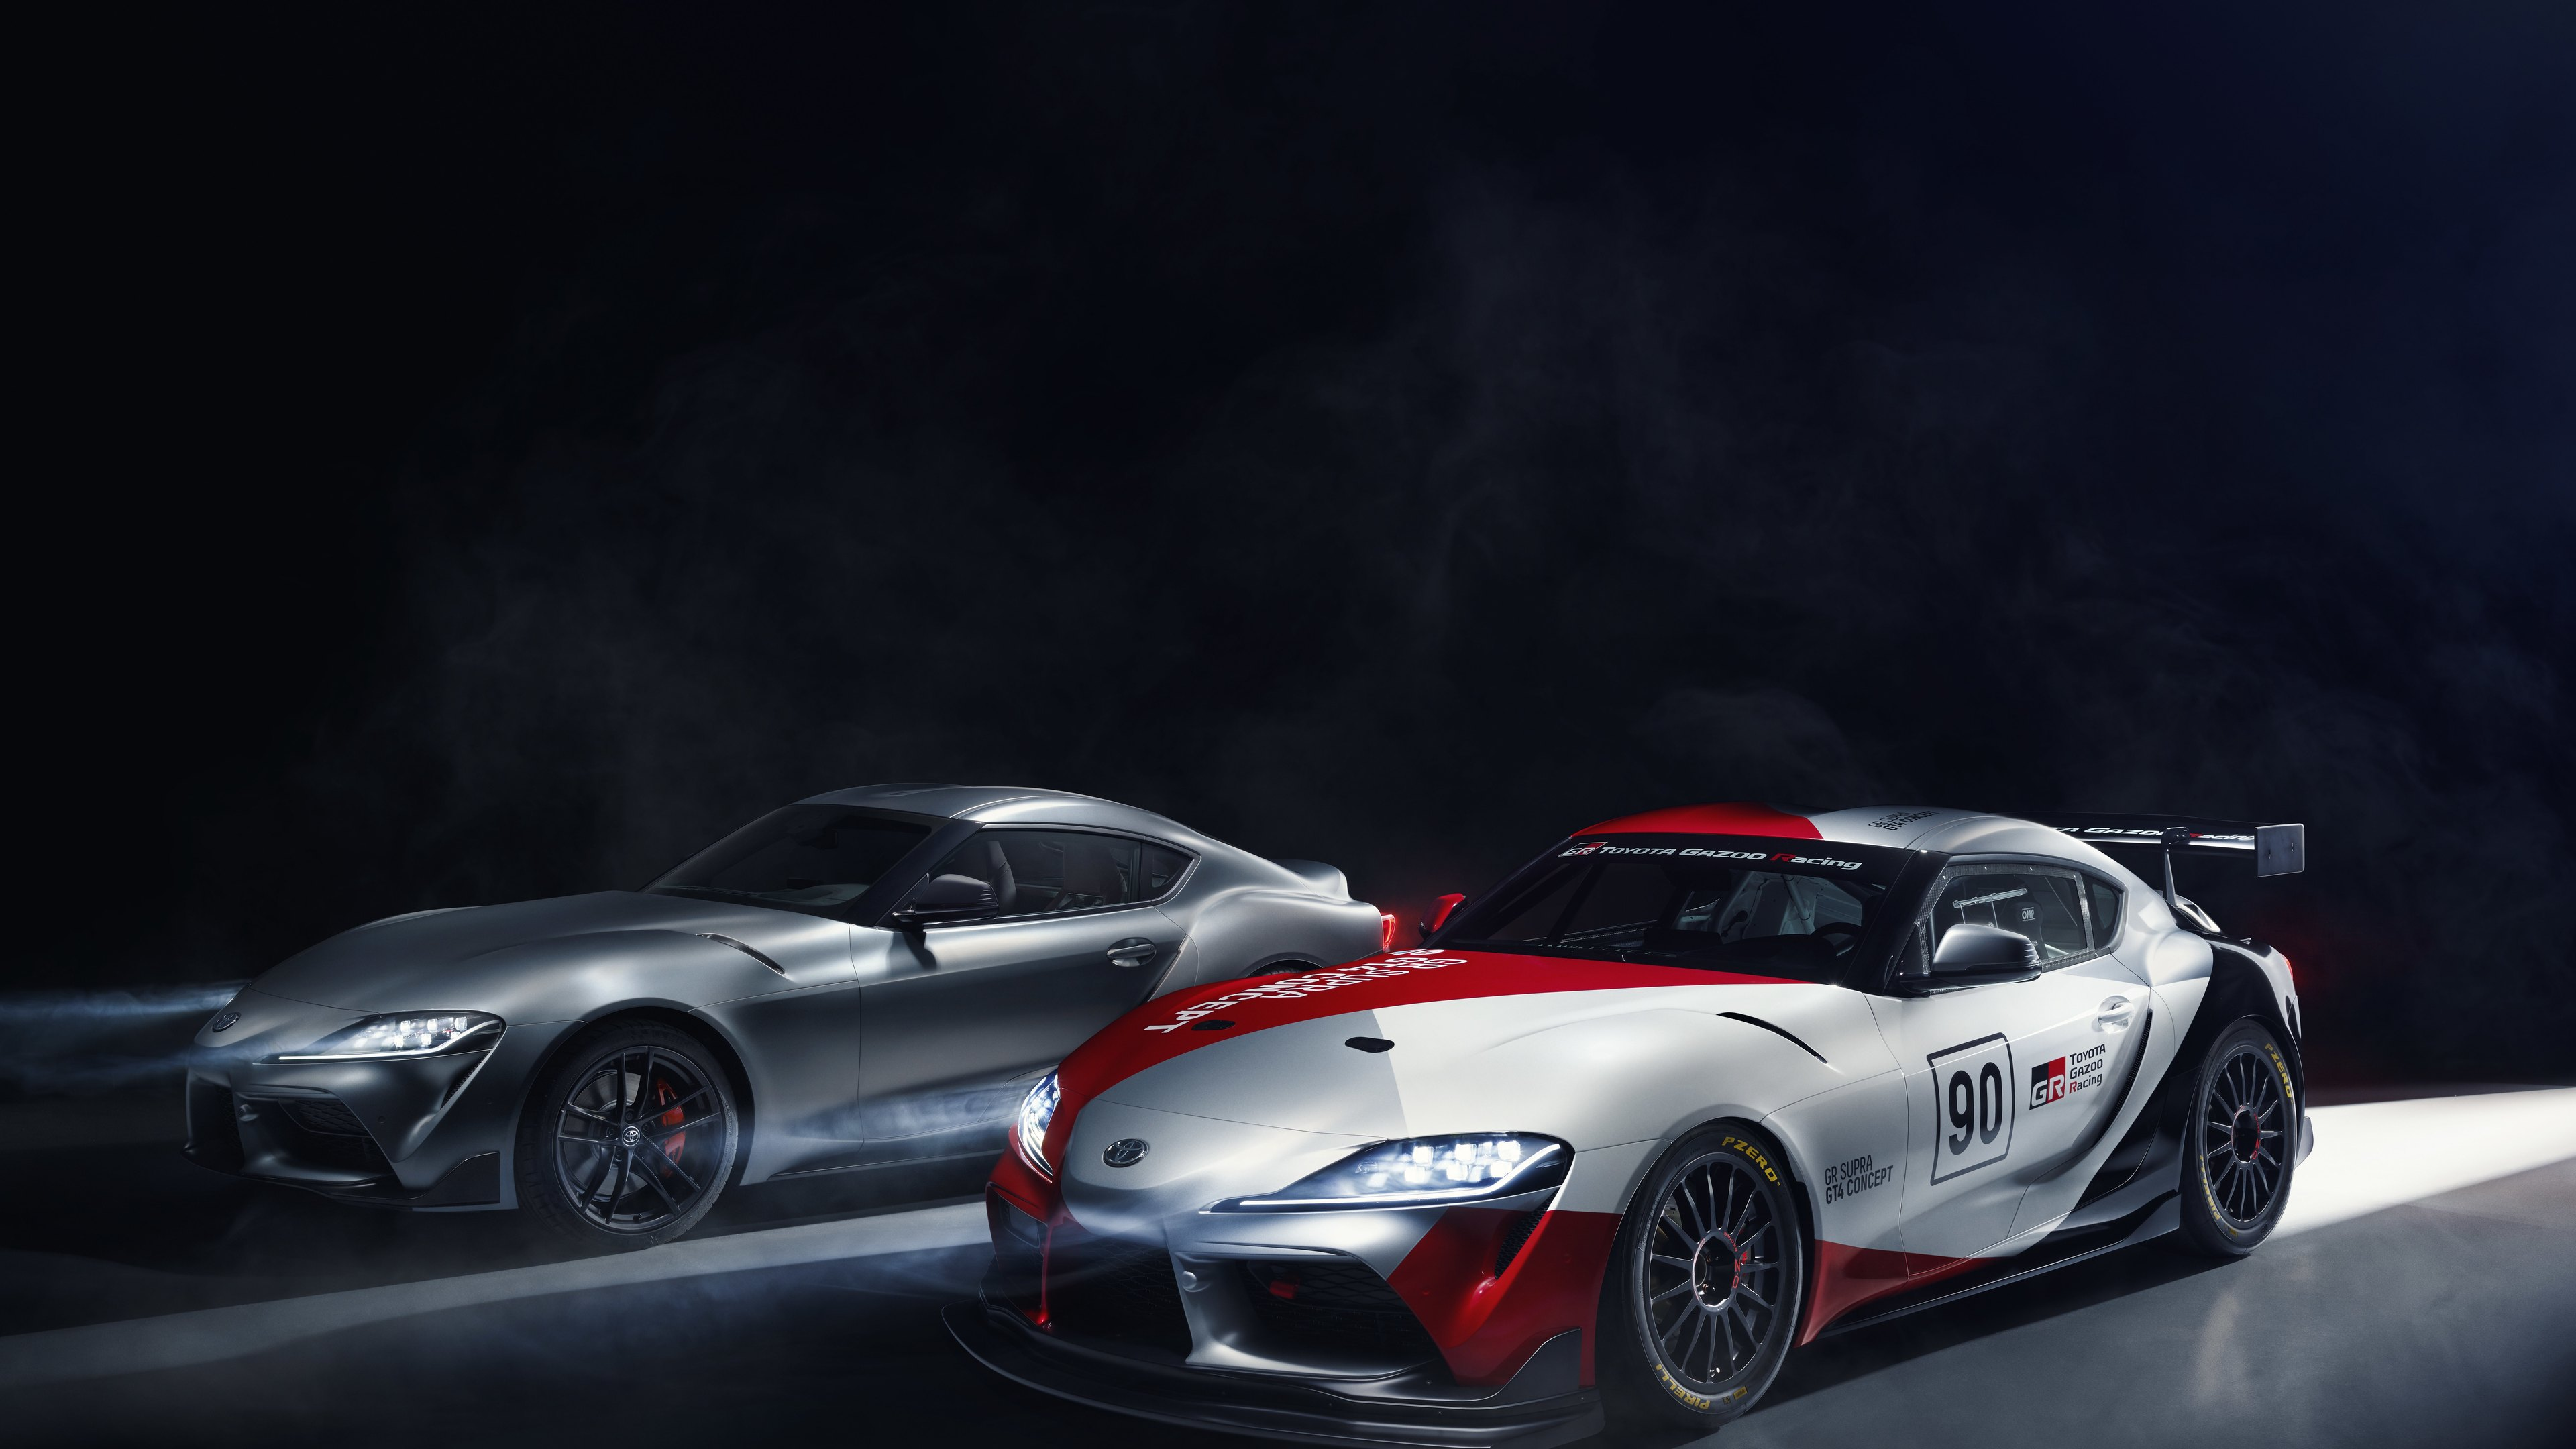 2019 toyota gr supra gt4 concept 4k 1553075836 - 2019 Toyota GR Supra GT4 Concept 4k - toyota wallpapers, toyota supra wallpapers, hd-wallpapers, cars wallpapers, 8k wallpapers, 5k wallpapers, 4k-wallpapers, 2018 cars wallpapers, 10k wallpapers